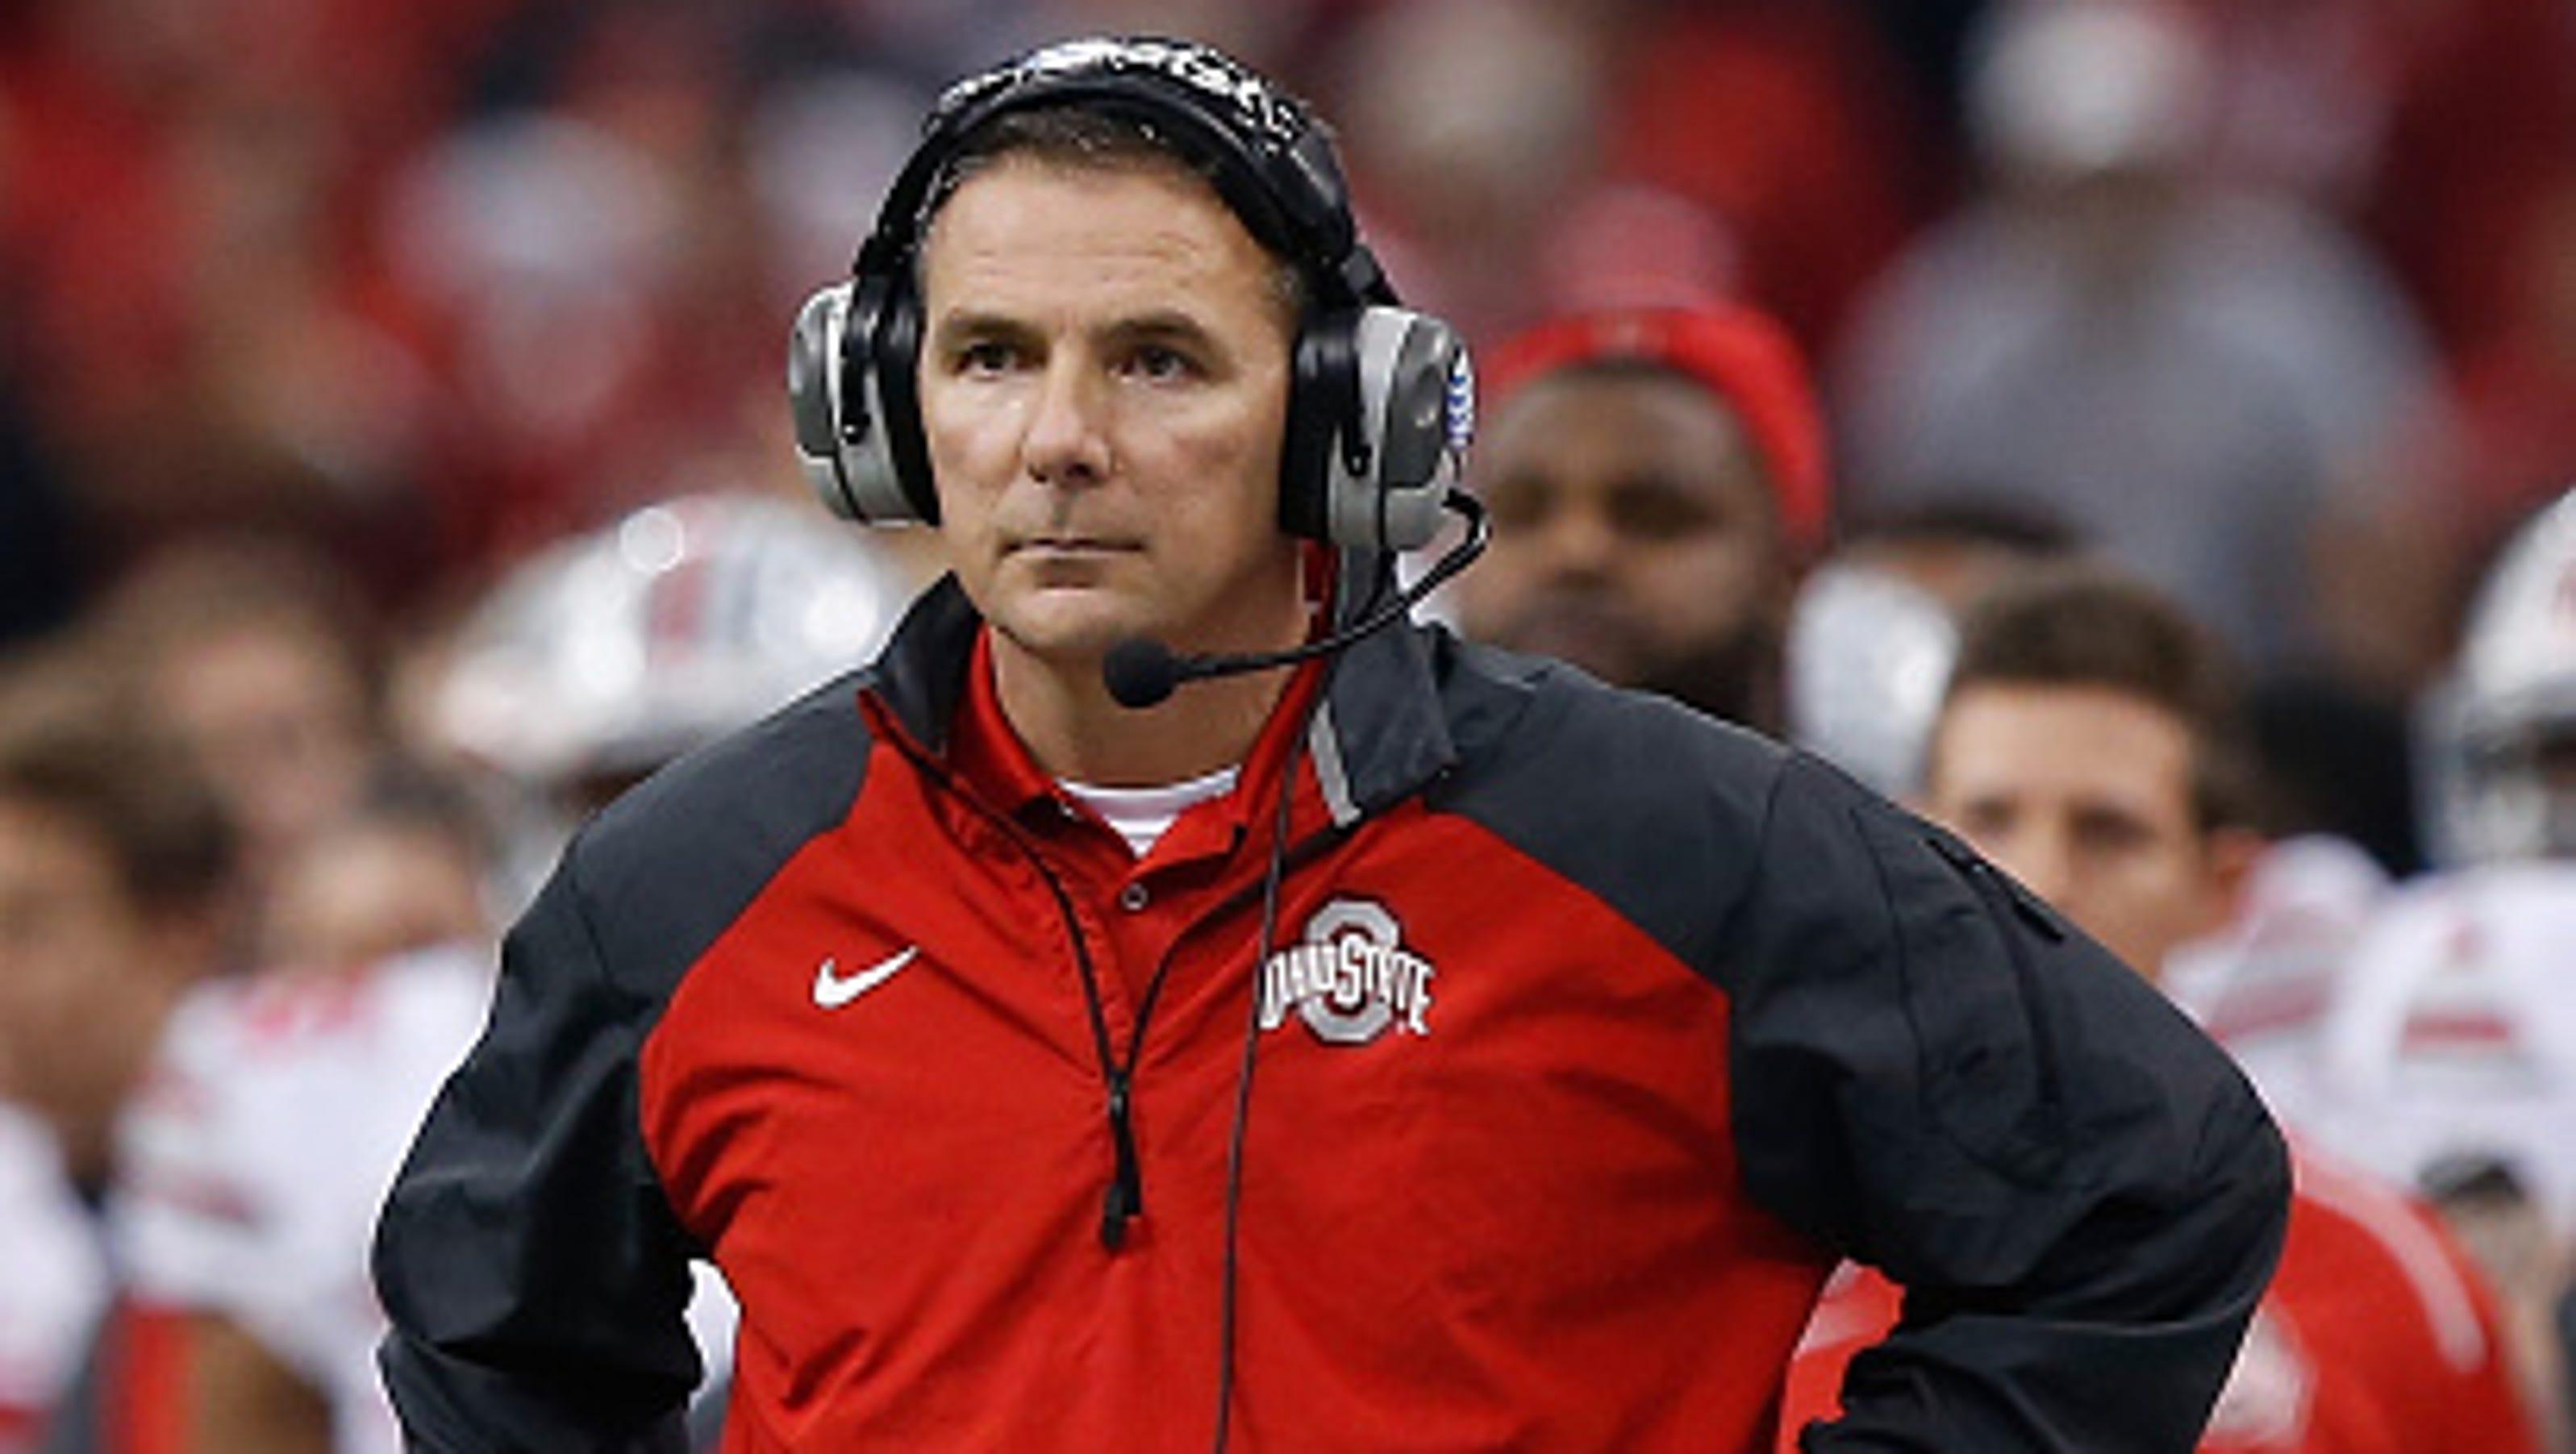 Urban Meyer is a Better Coach than Nick Saban » The Sports Post